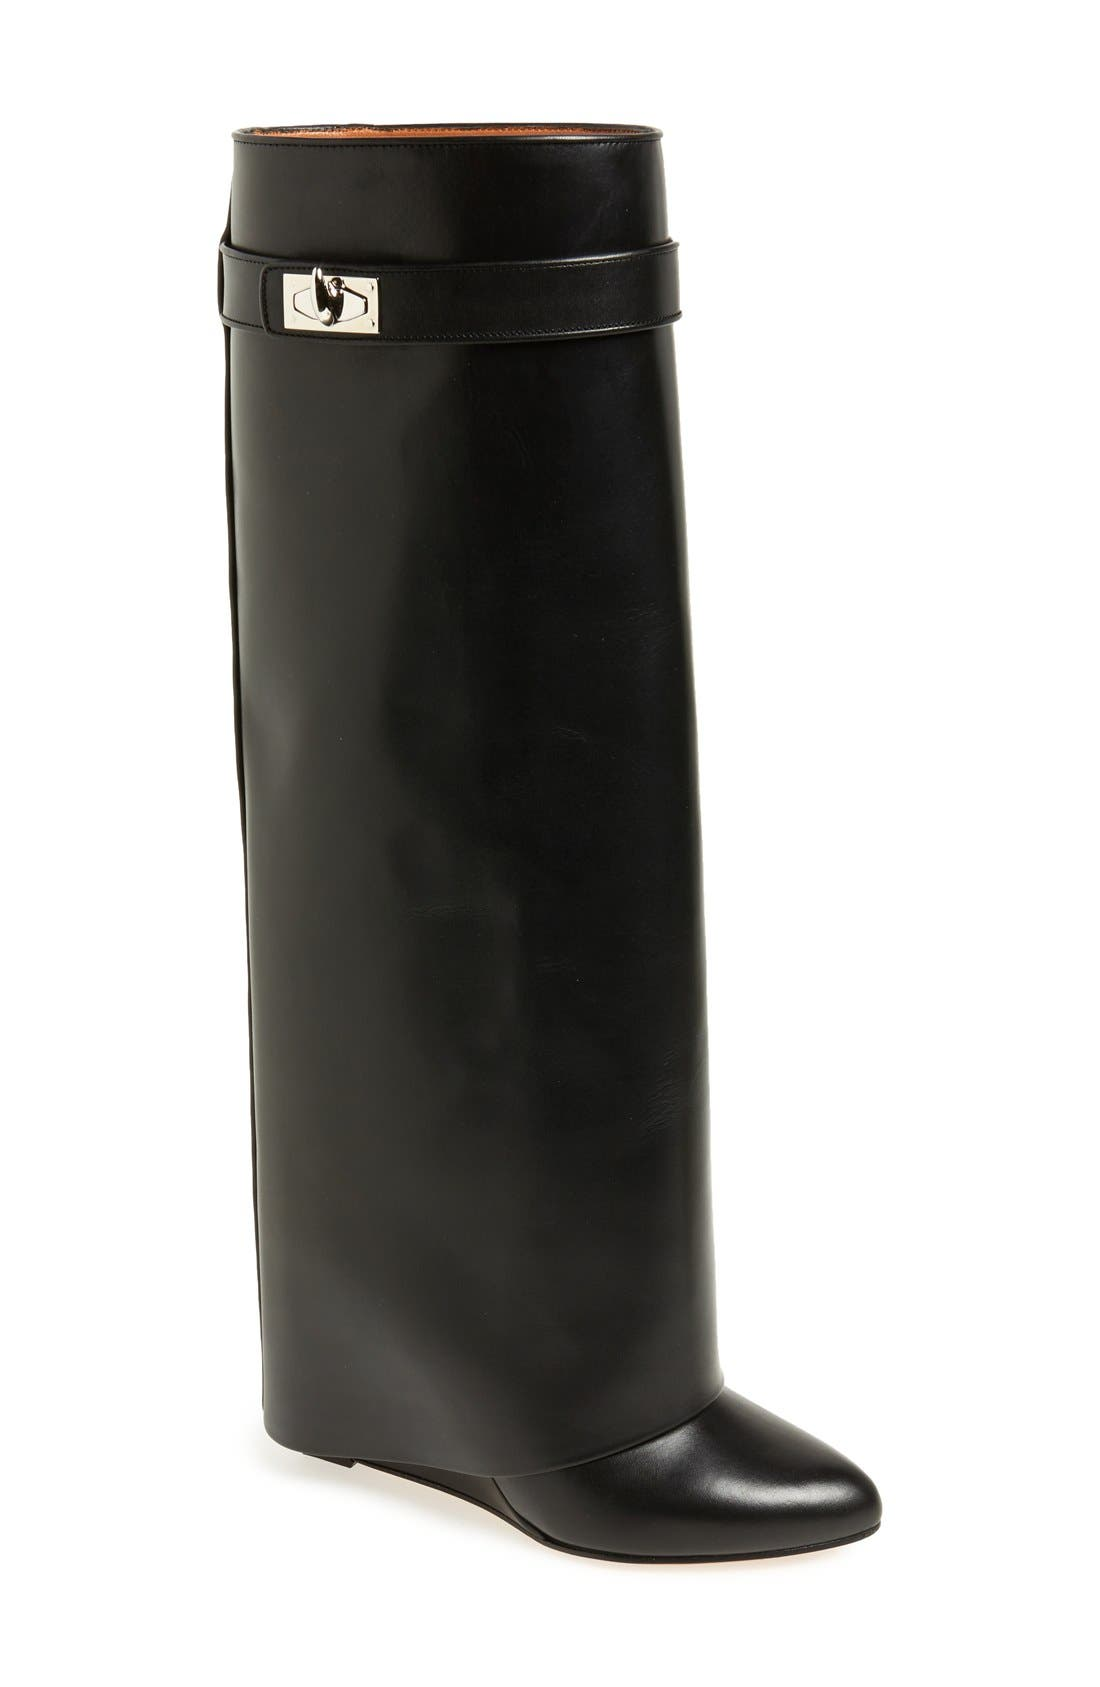 Main Image - Givenchy Shark-Tooth Pant-Leg Knee Boot (Women)